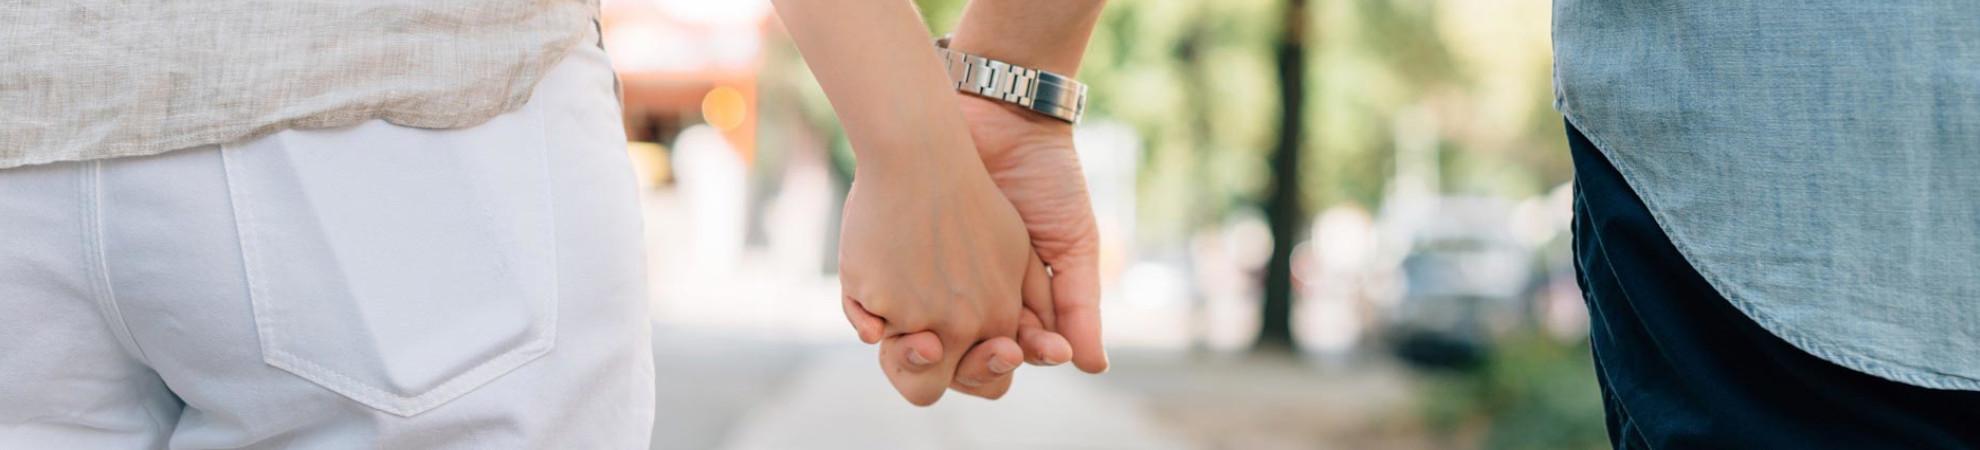 Eheberatung | Kommentare